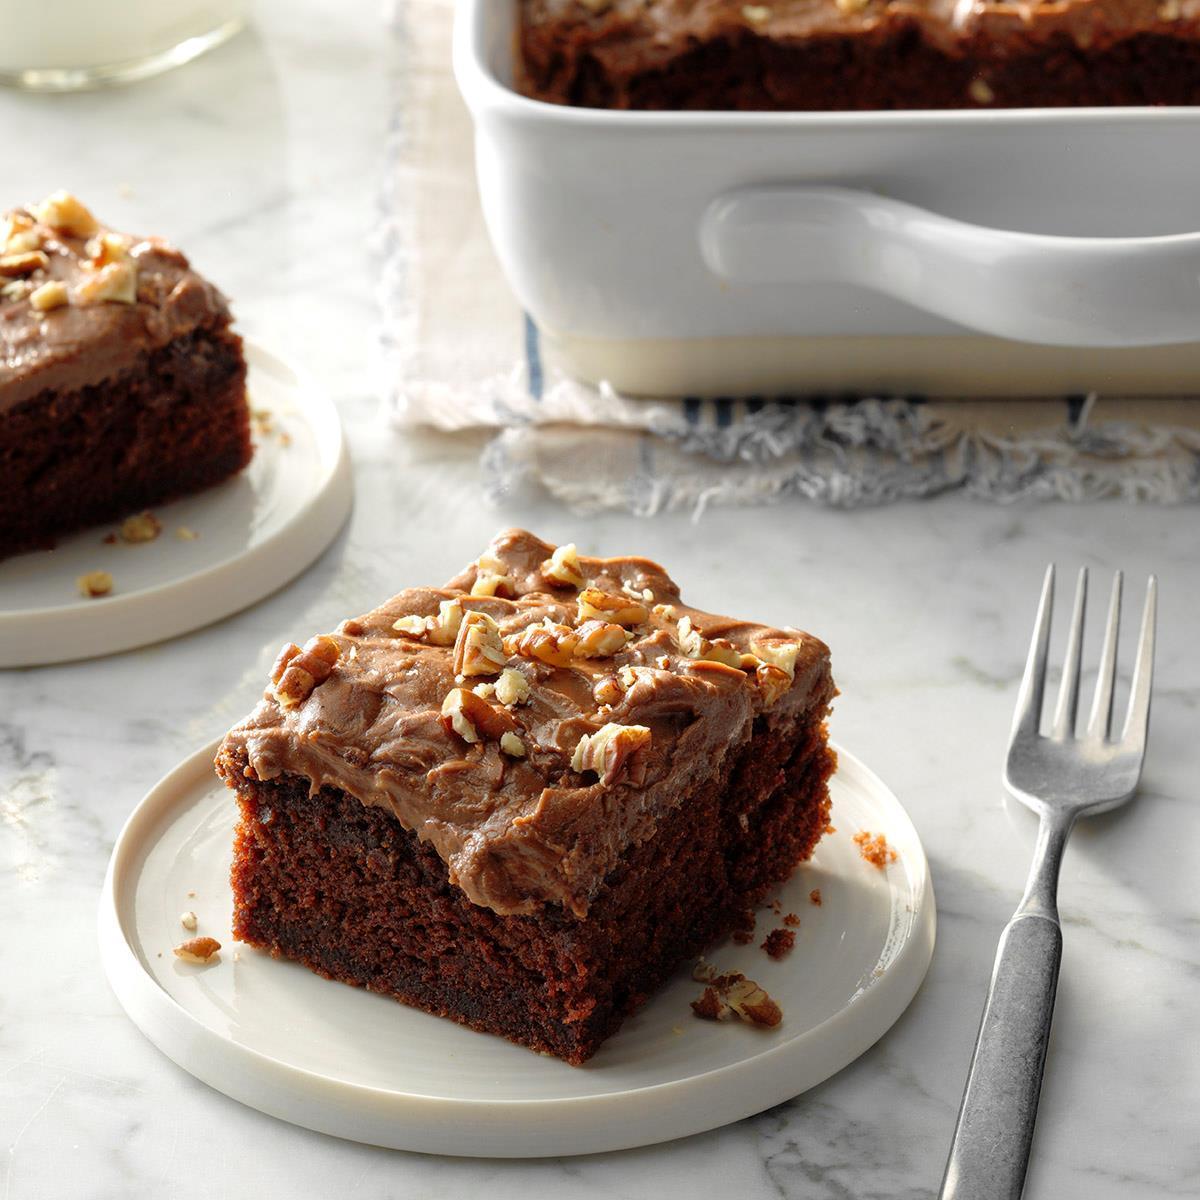 Cinnamon Chocolate Cake image